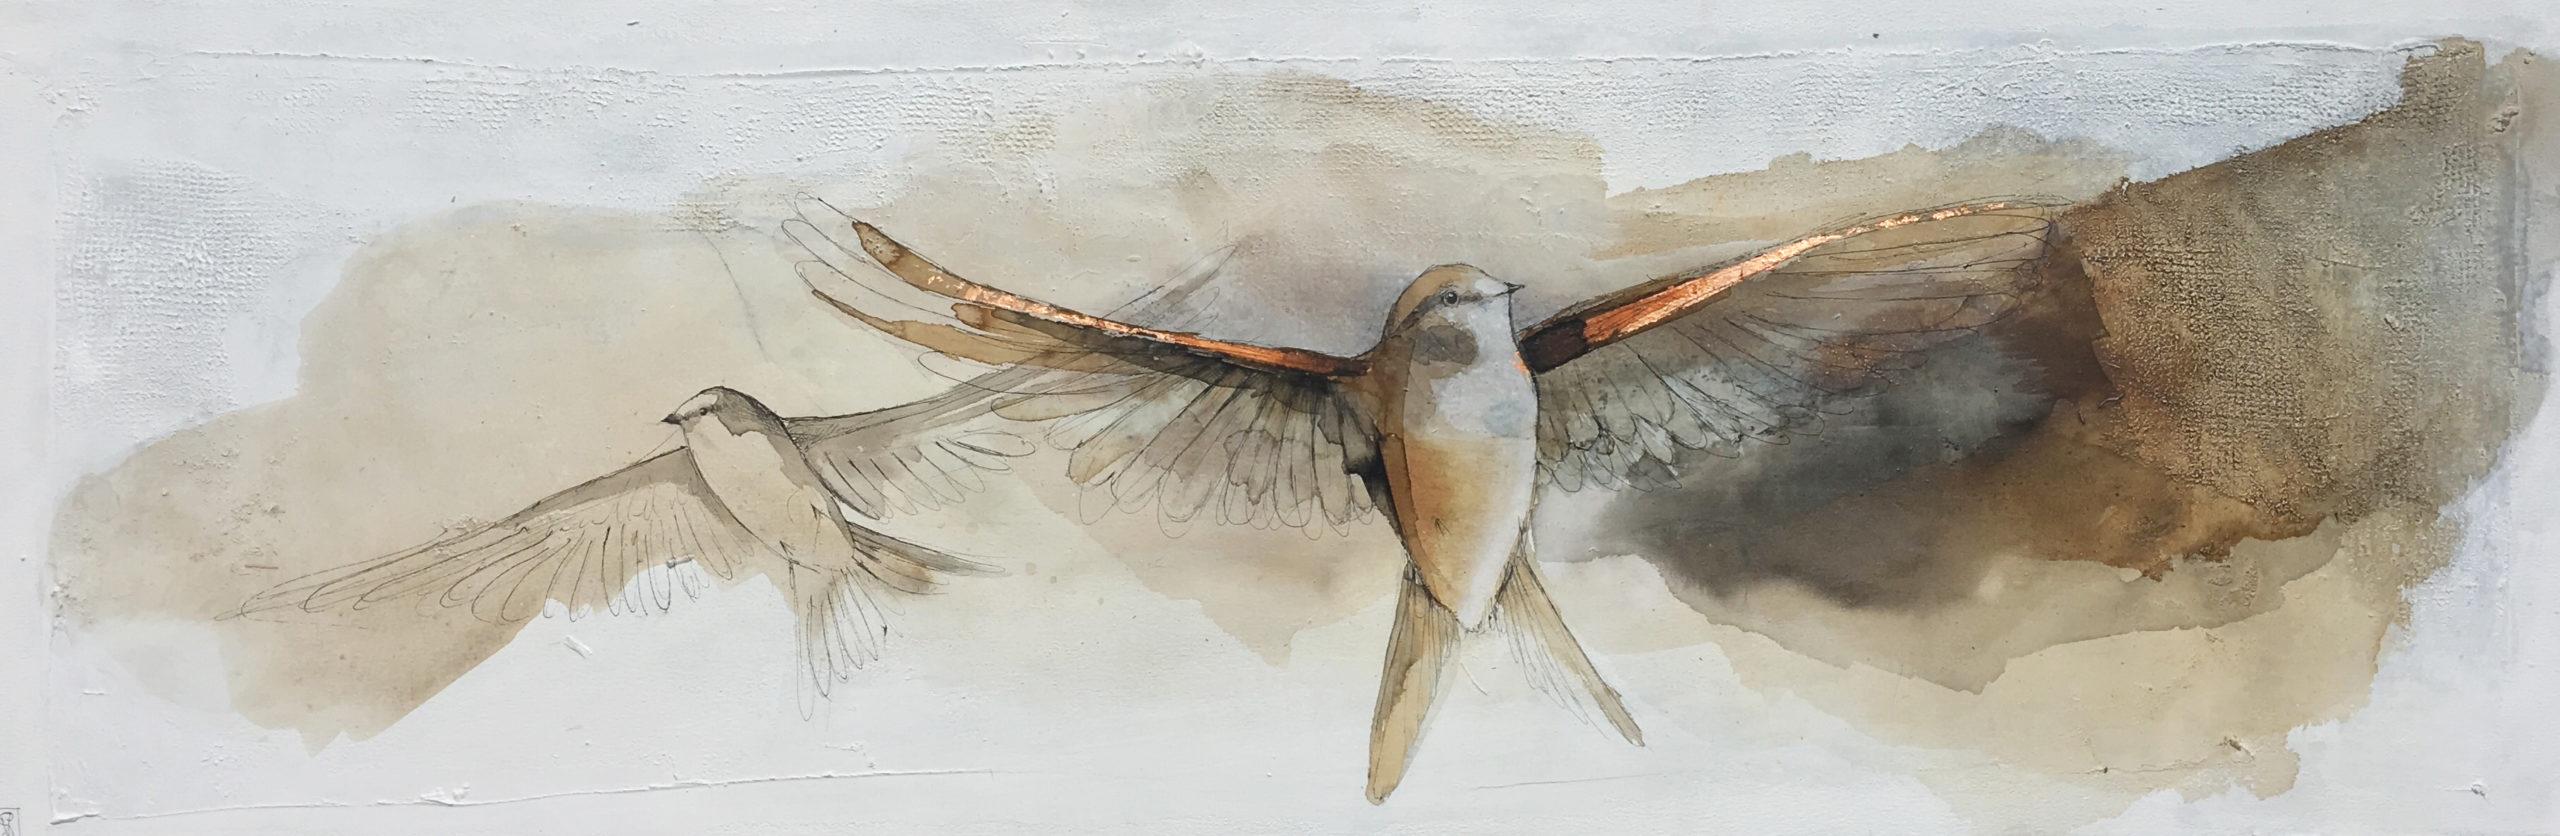 Vicky Sanders Abstract Figurative - Birds in Flight